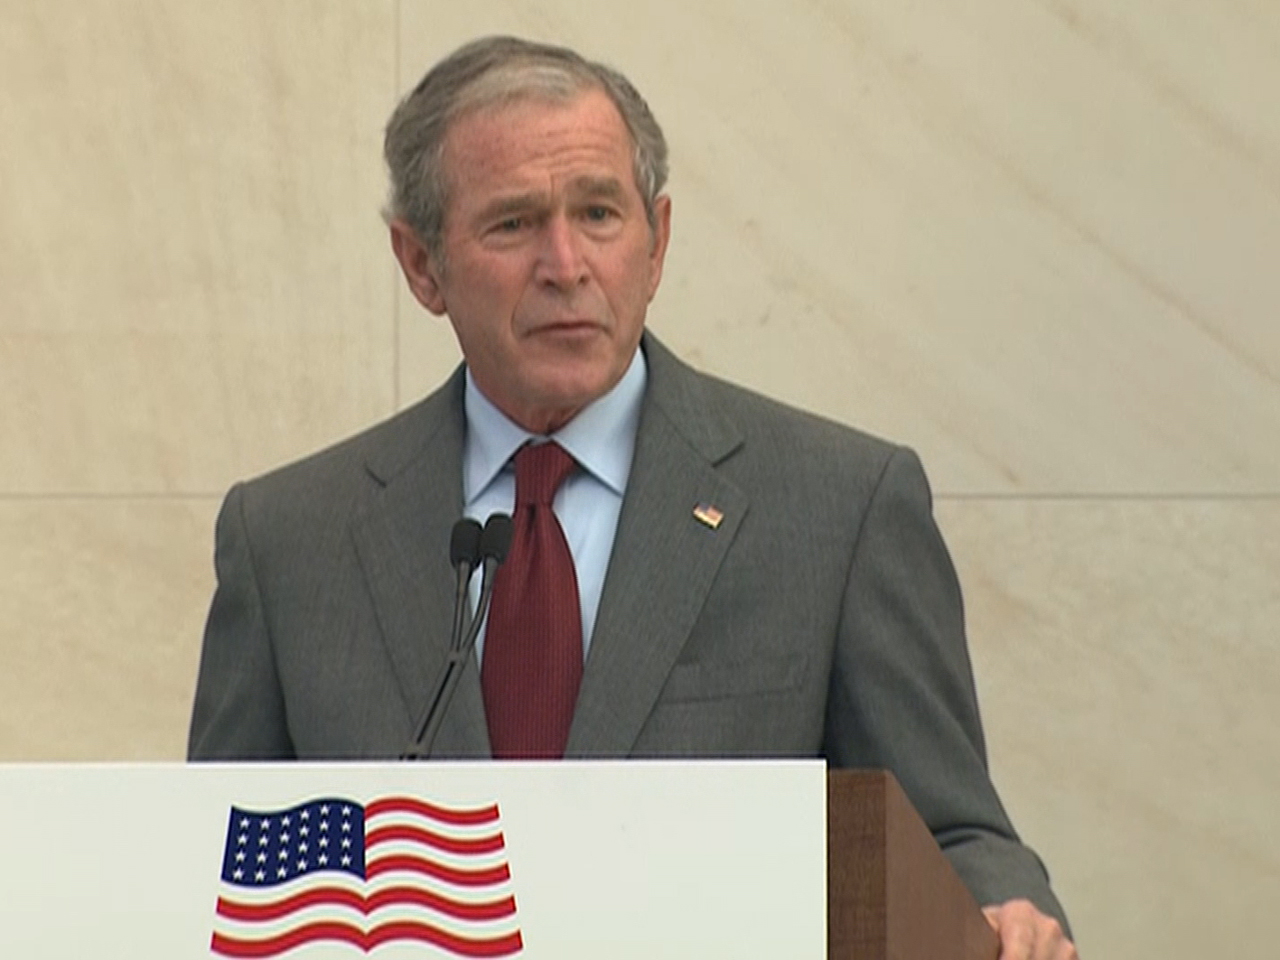 George Bush Funny Hd Desktop Wallpaper 1920x1200